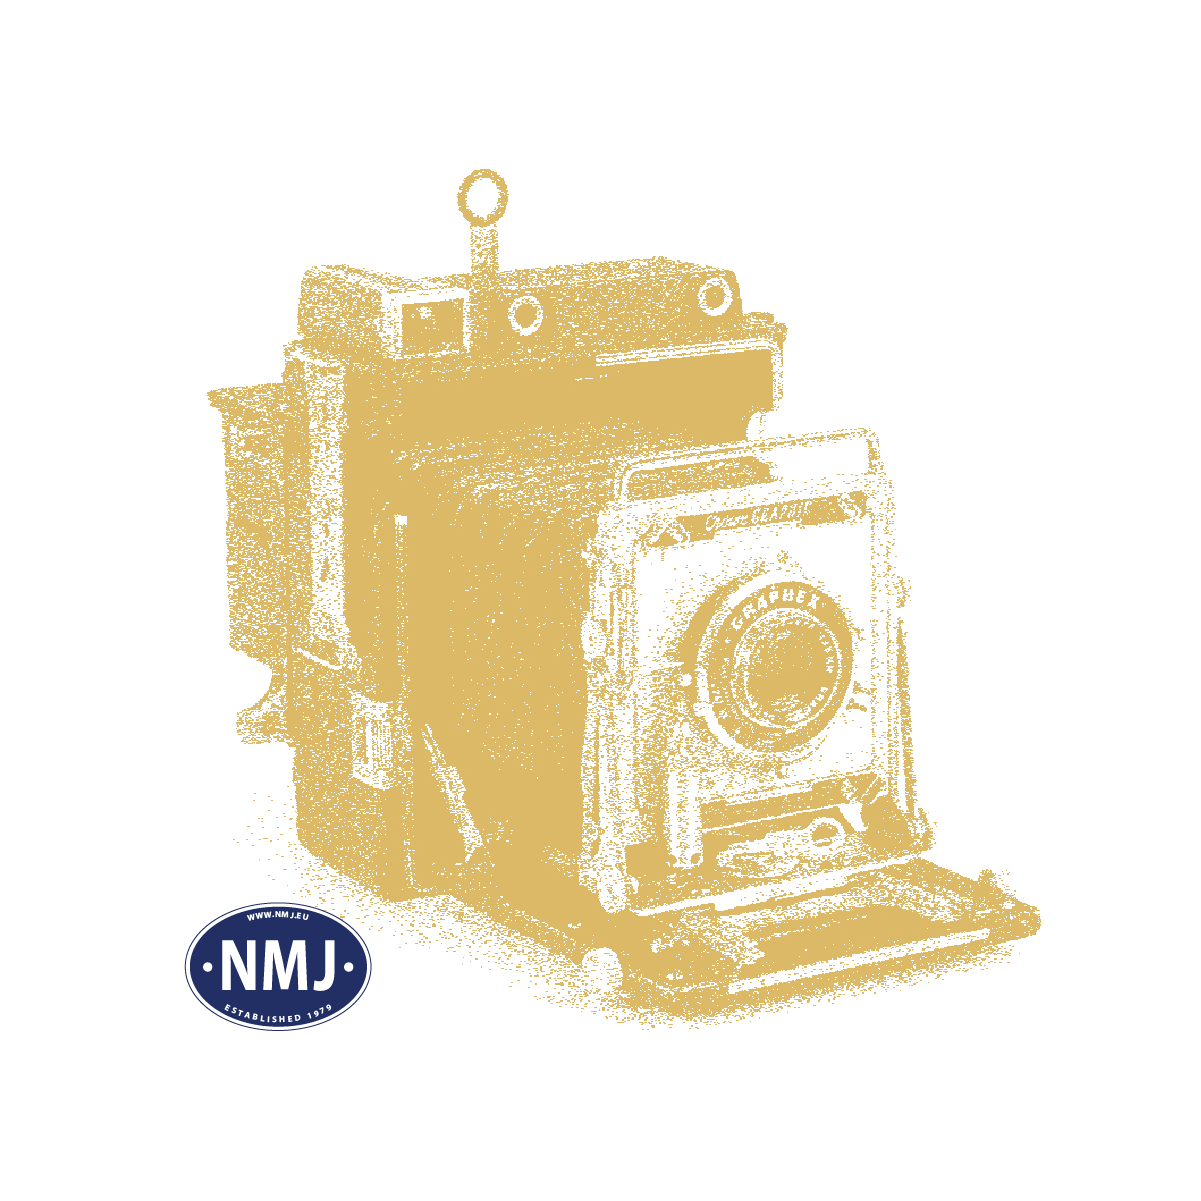 NMJT504.301 - NMJ Topline NSB His 210 2 269-8